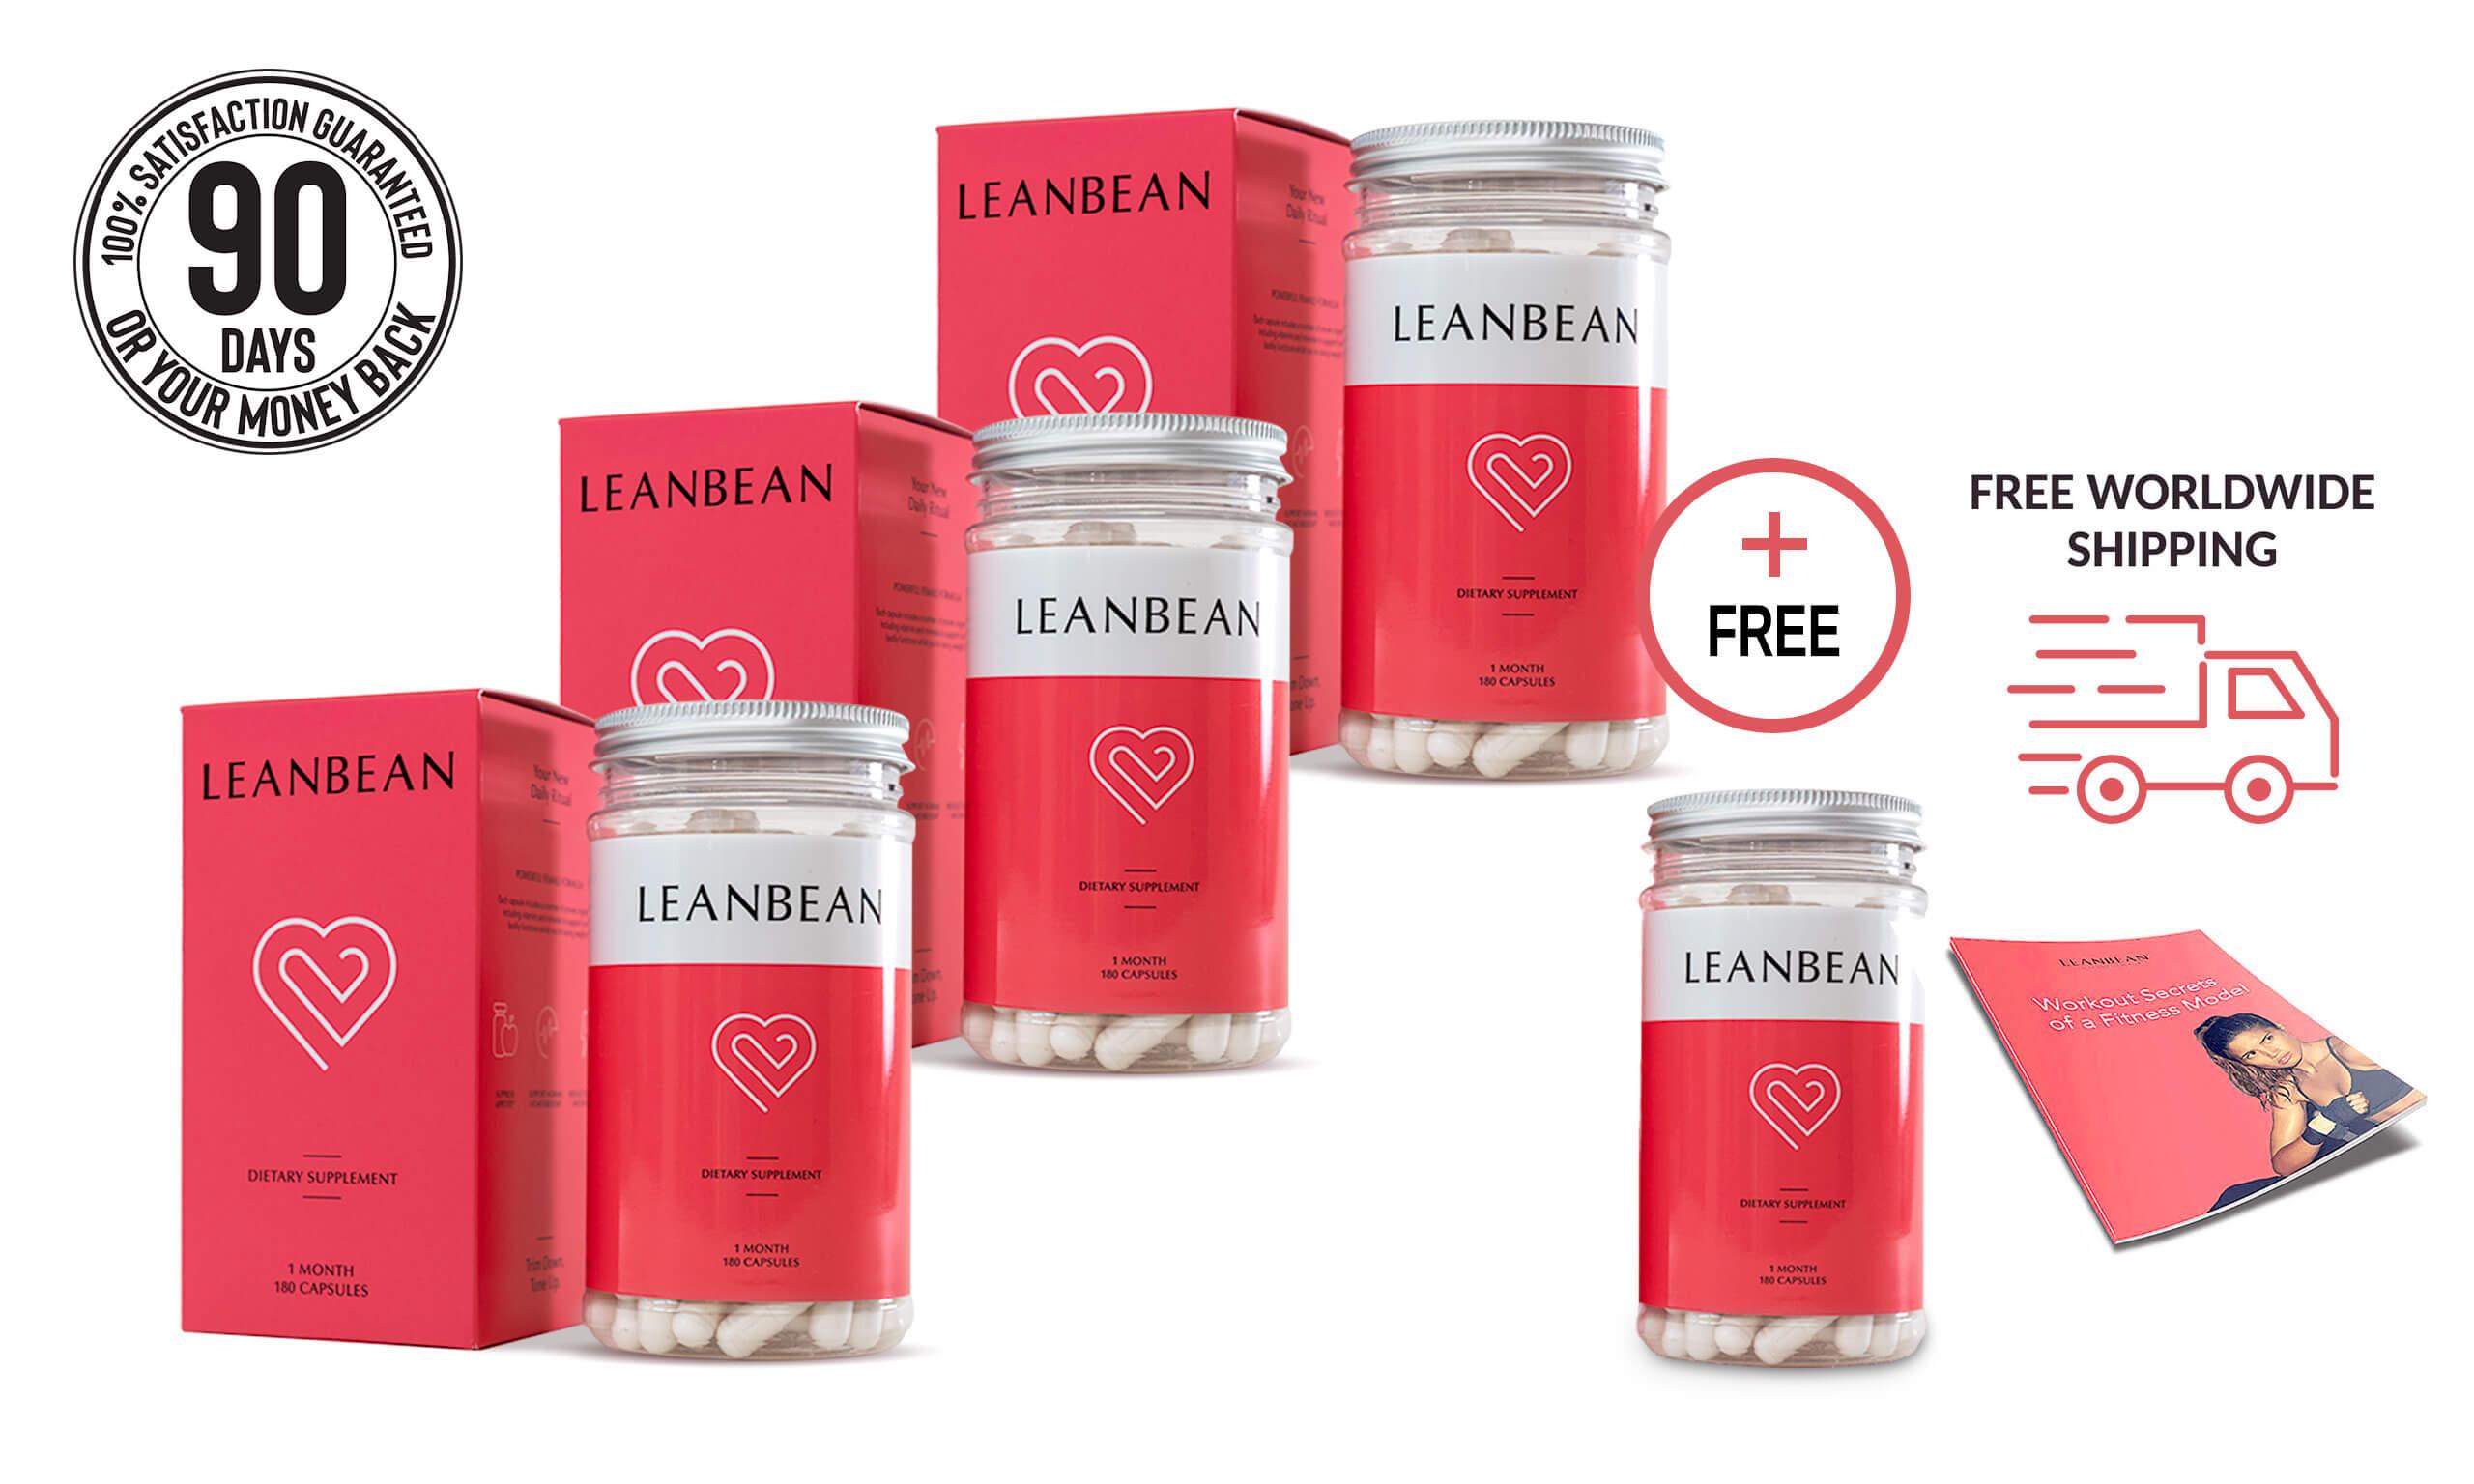 Leanbean multipack x4 bundle